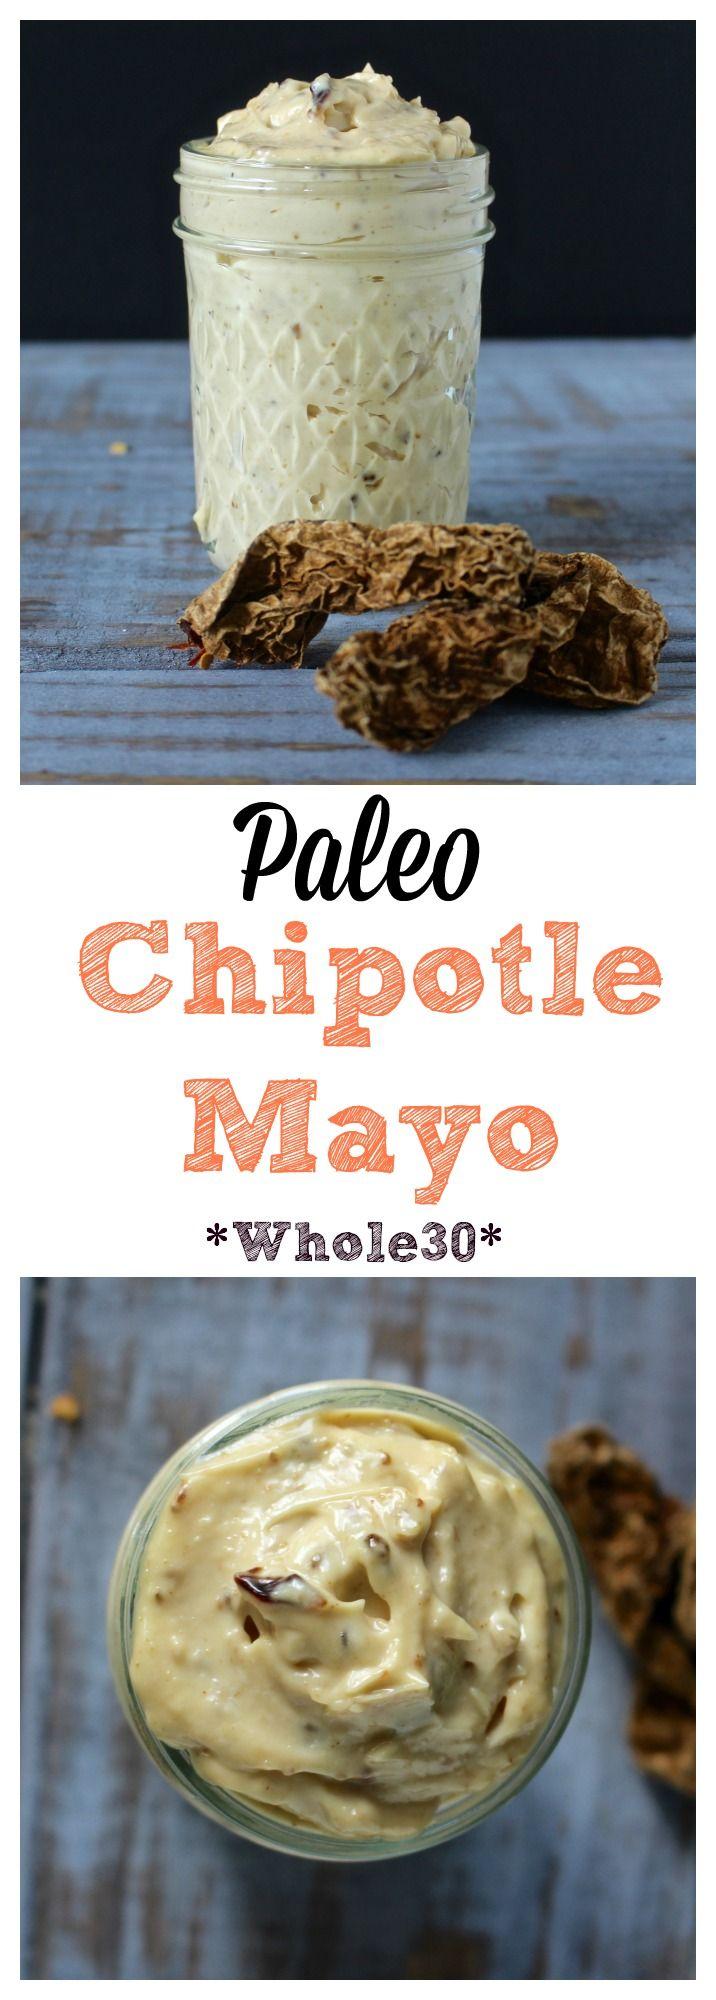 Paleo Chipotle Mayo | Recipe | Chipotle, Chipotle Mayo and Paleo